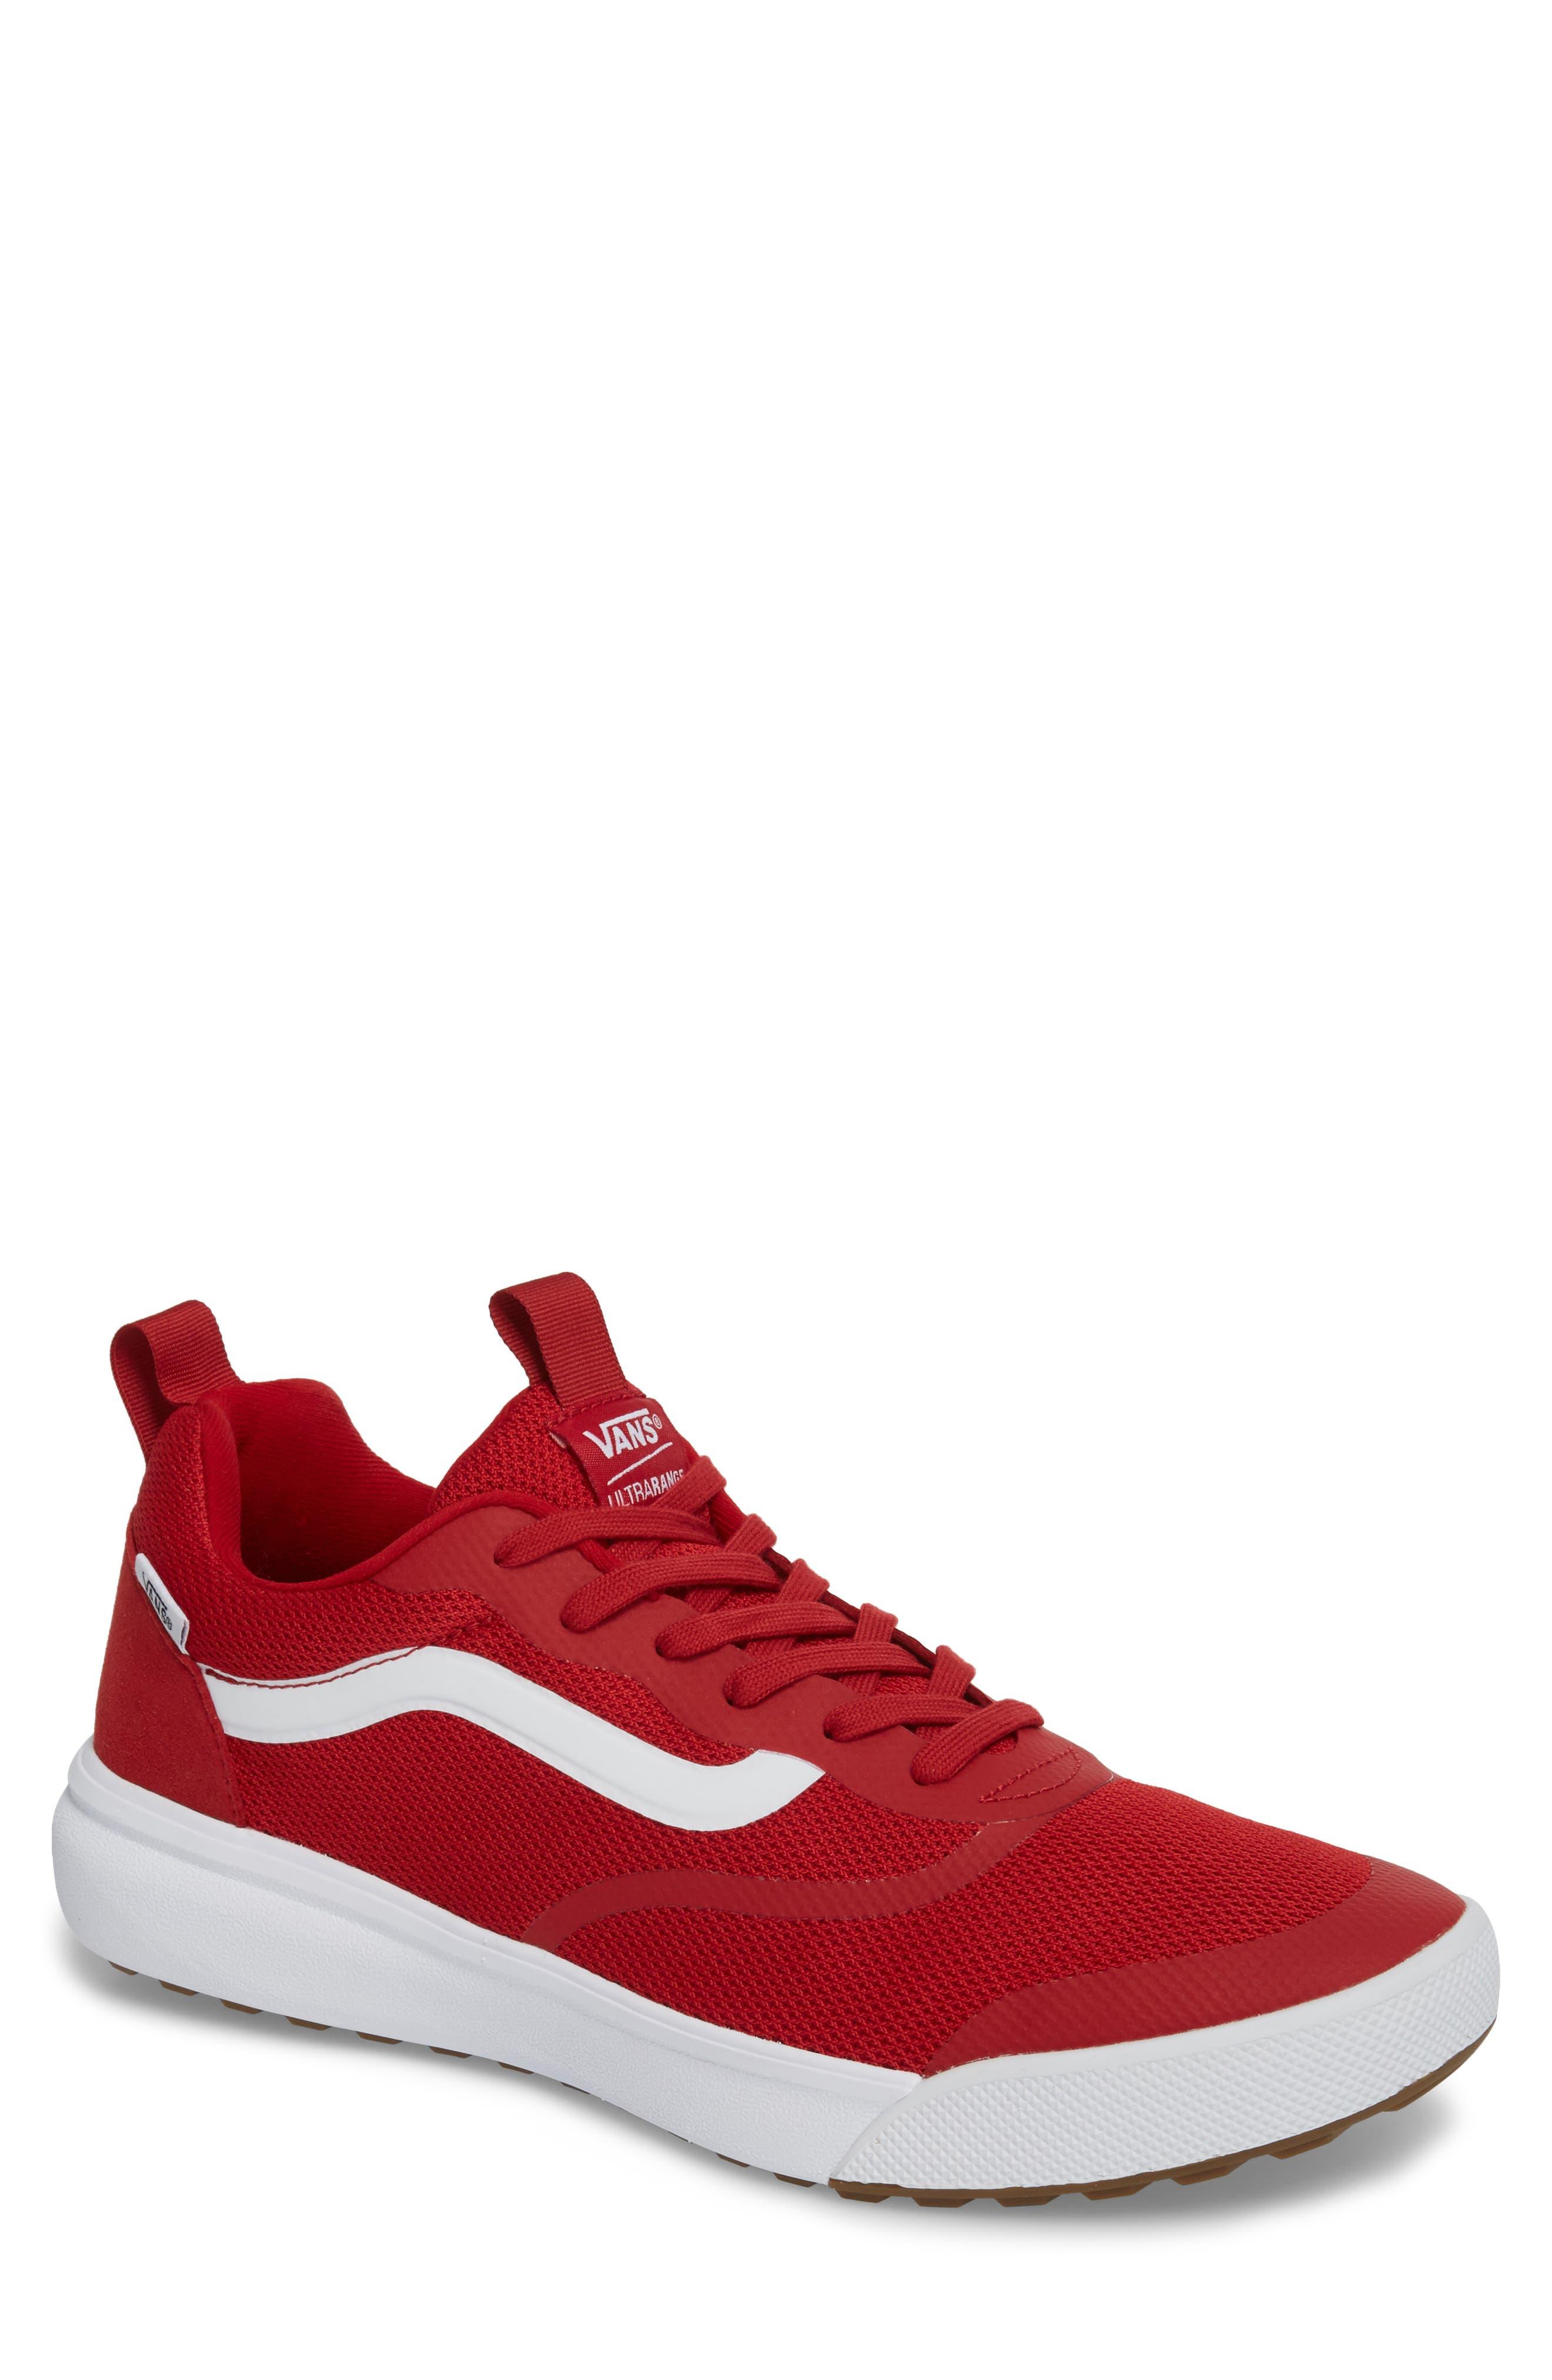 Ultrarange Rapidwield Sneaker,                             Main thumbnail 1, color,                             Chili Pepper